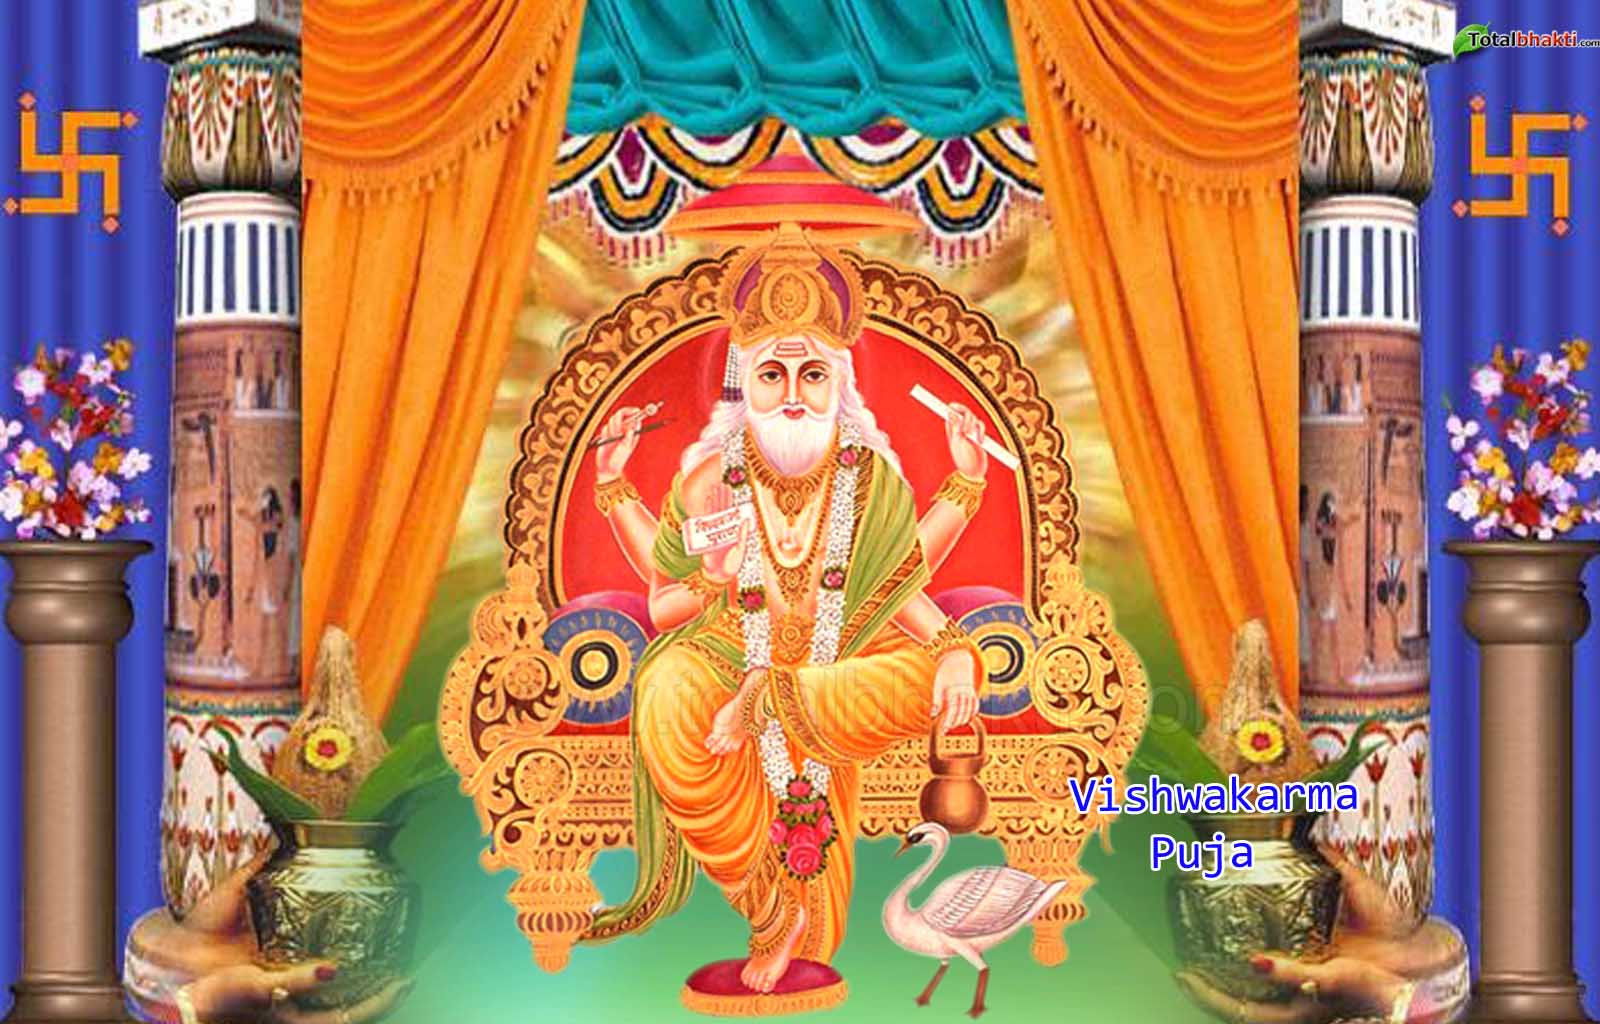 Most Inspiring Wallpaper Lord Vishwakarma - bm-image-788641  You Should Have_546727.jpeg